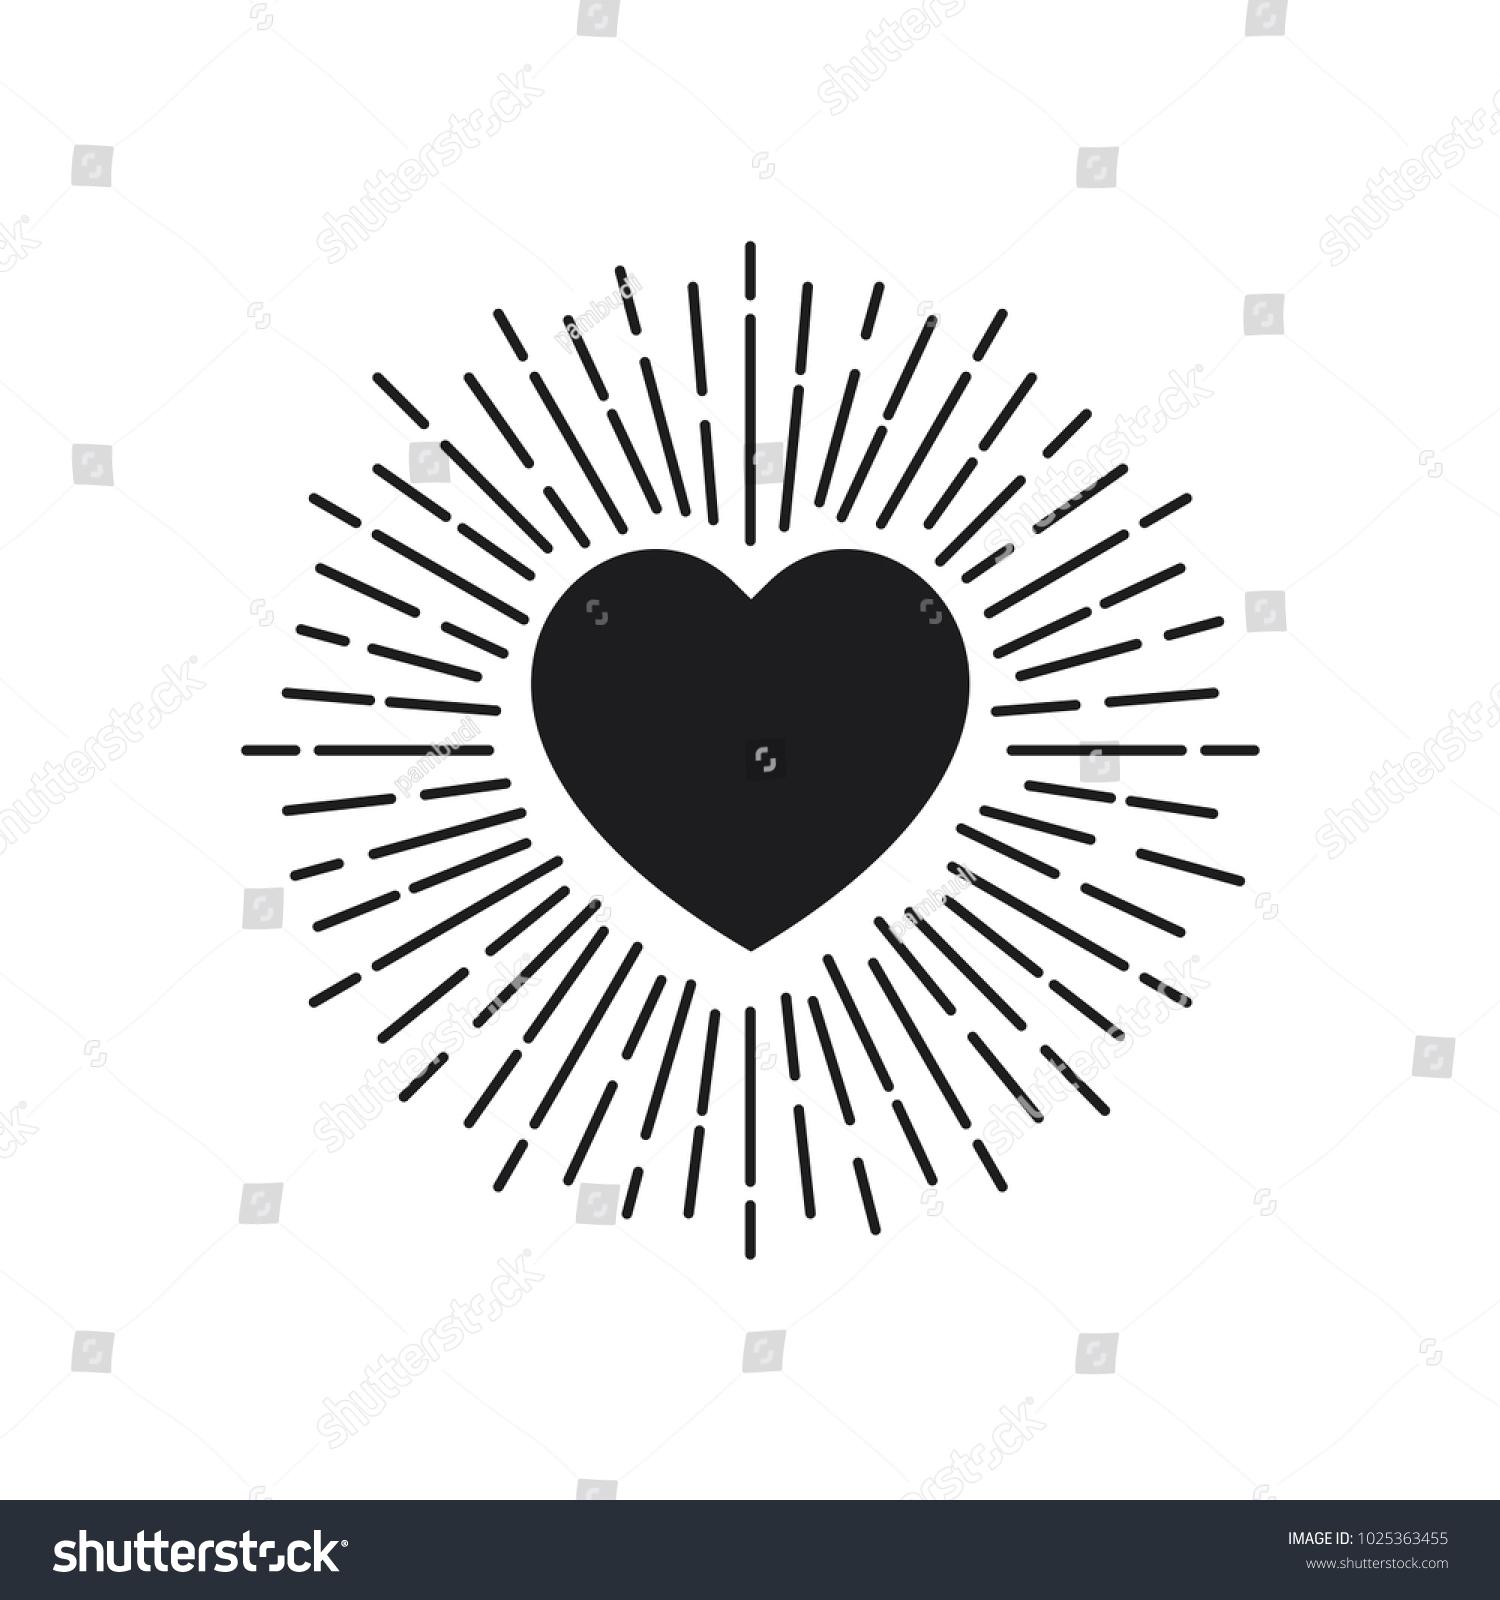 Love symbol heart icon trendy flat stock vector 1025363455 love symbol heart icon in trendy flat style buycottarizona